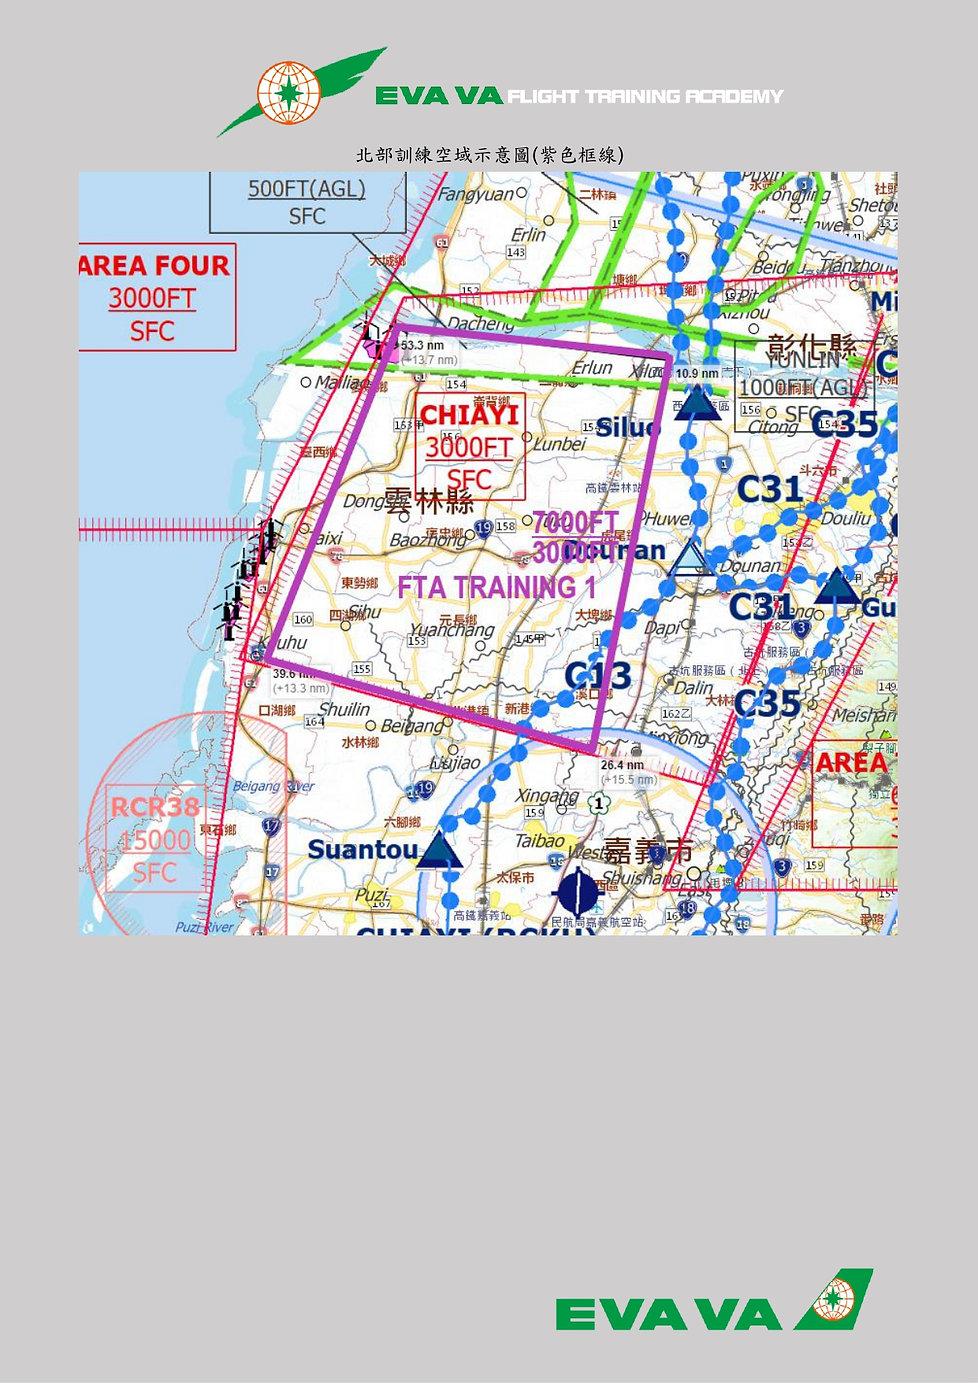 FTA TRAINING AREA V1.1_page-0002.jpg